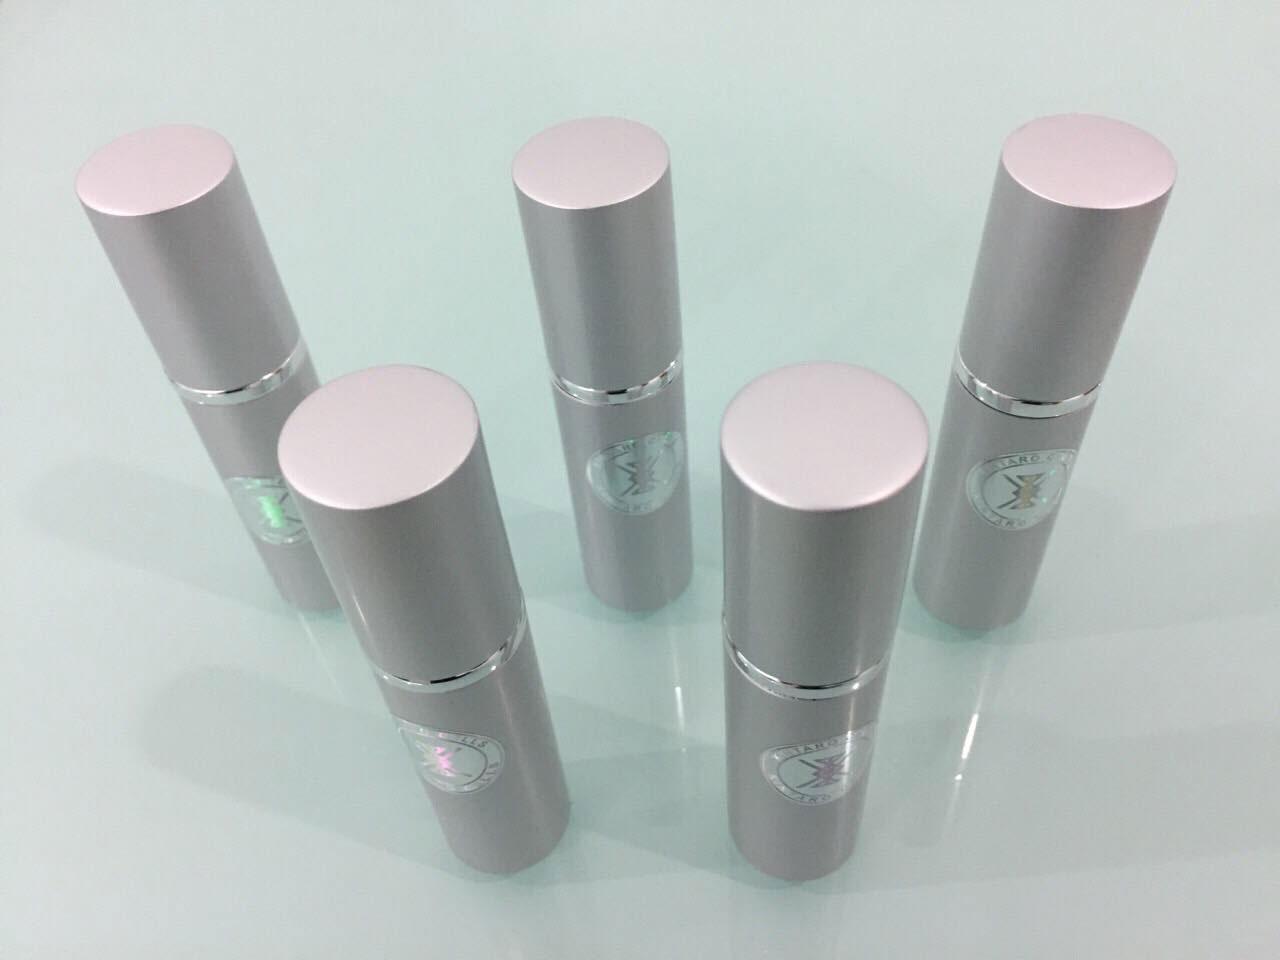 The unique biocosmetic product eKEM is an enrichment medium for cosmetics